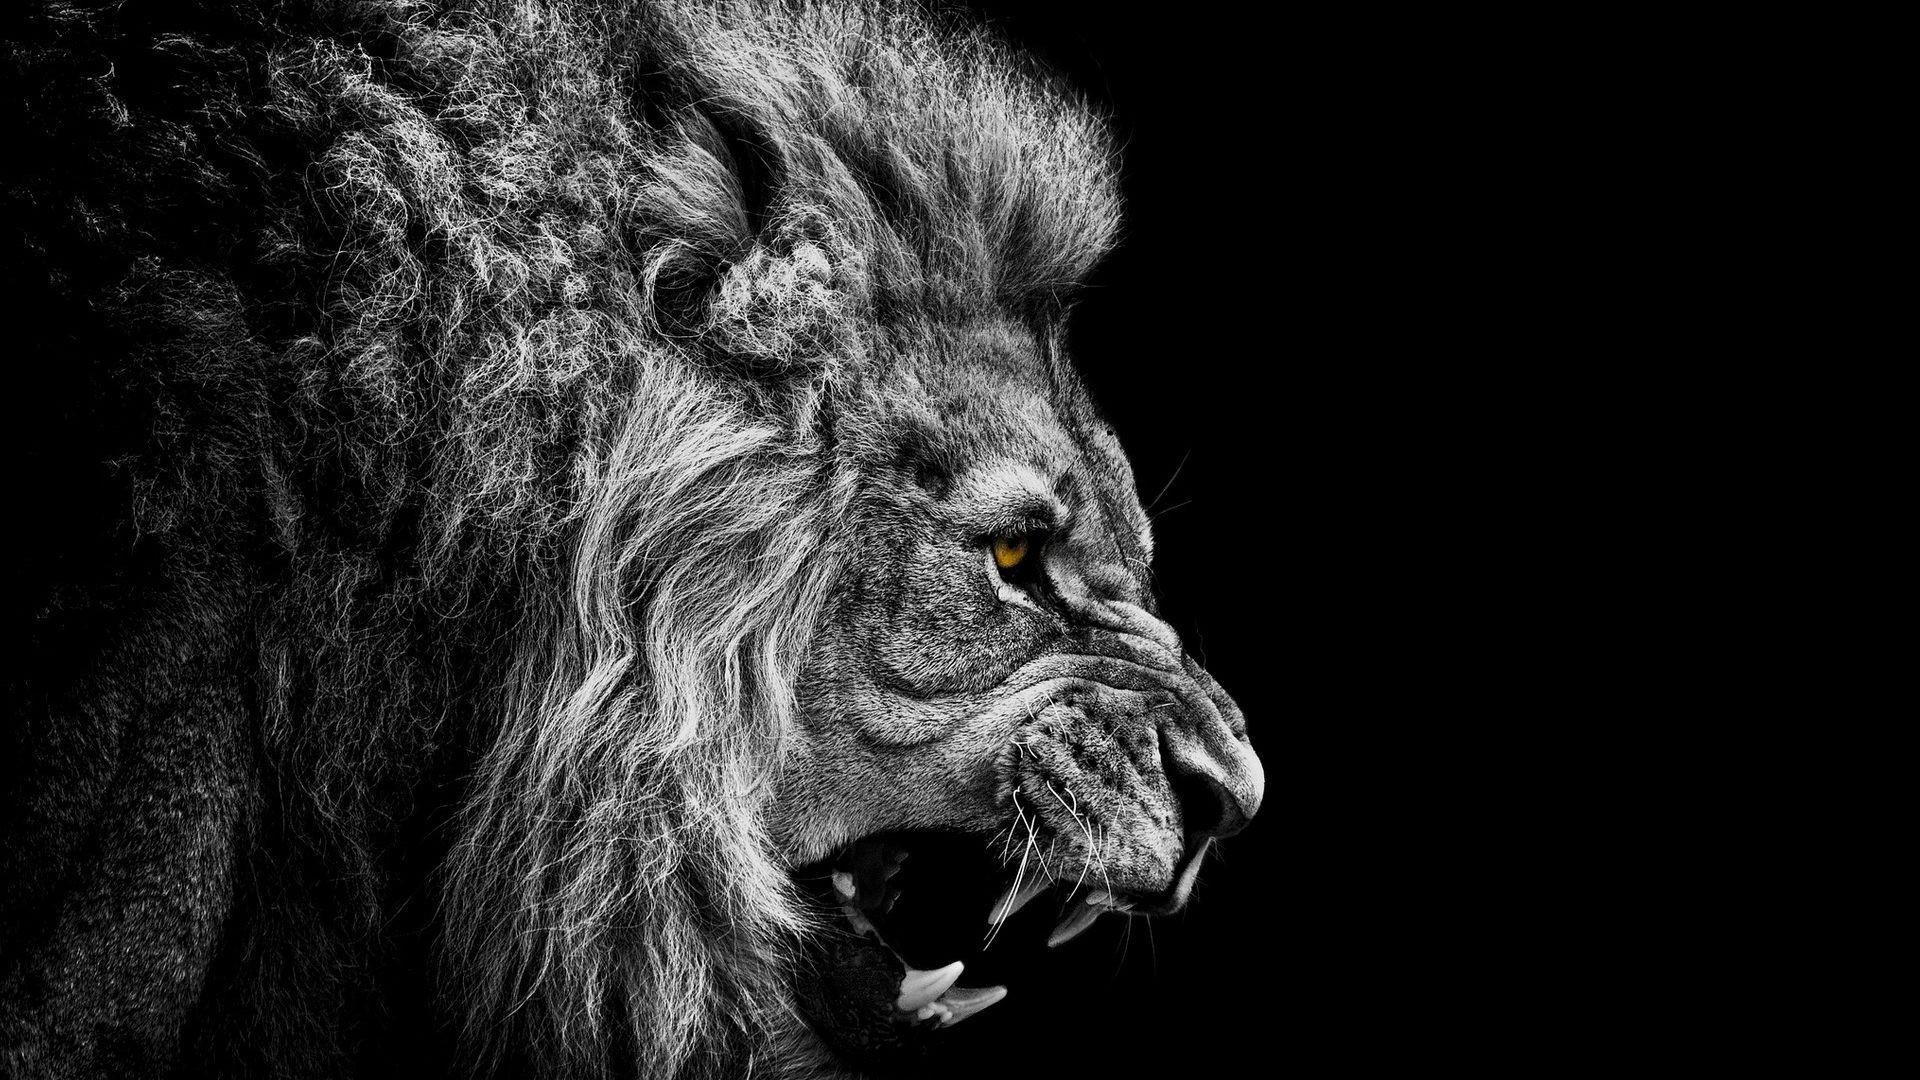 Lion Wallpaper #4 – Resolution:1920*1200